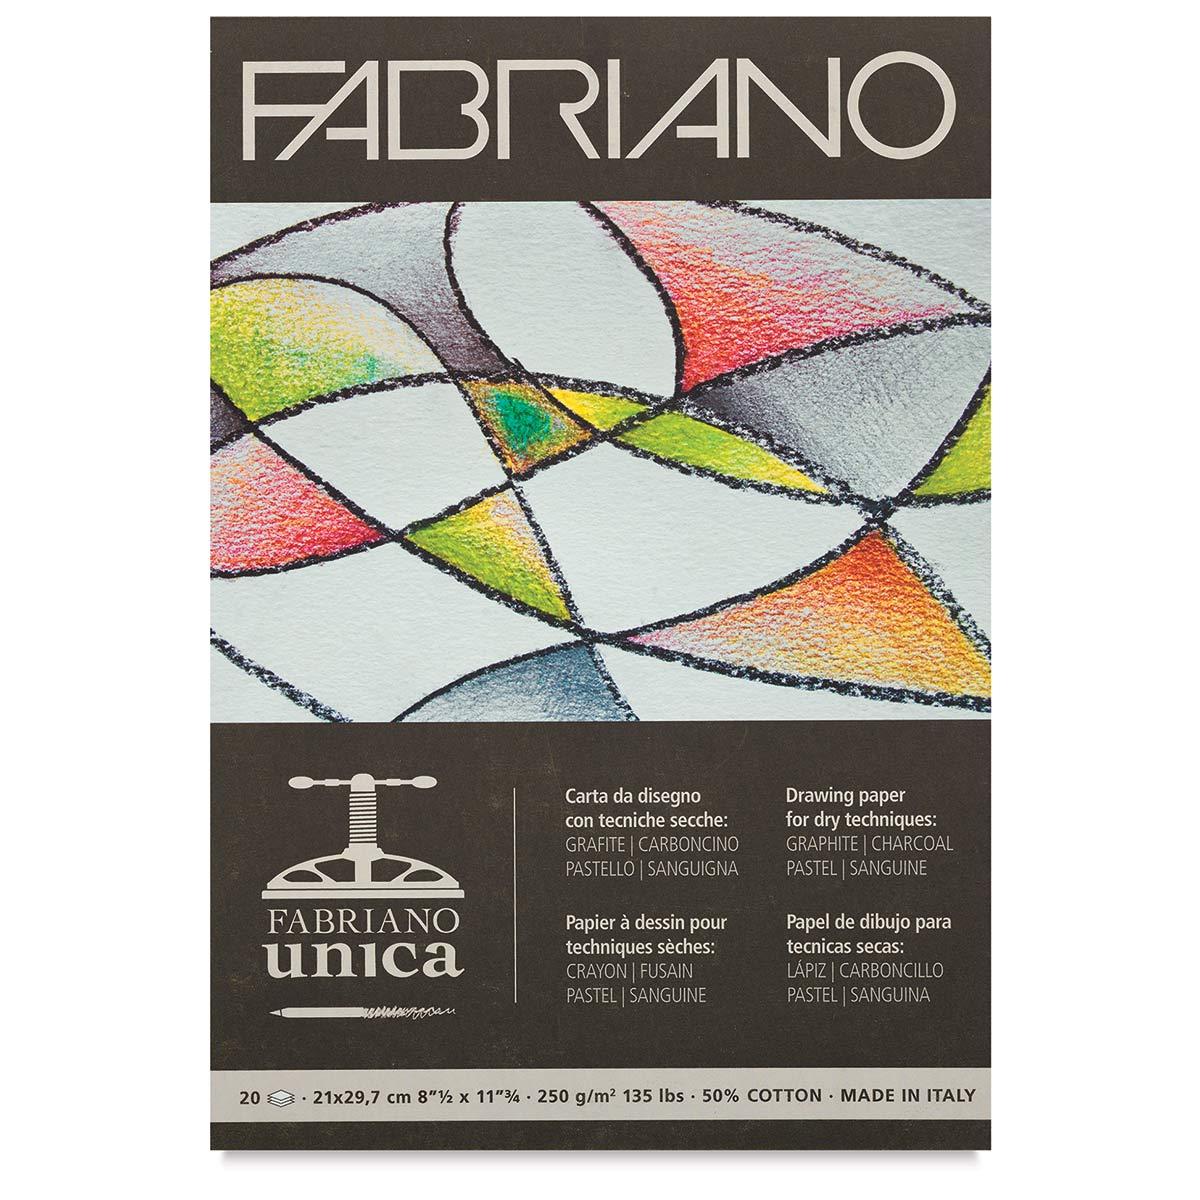 Fabriano Unica Printmaking Paper Pad - White, 8-1/4 x 11-3/4, 20 Sheets